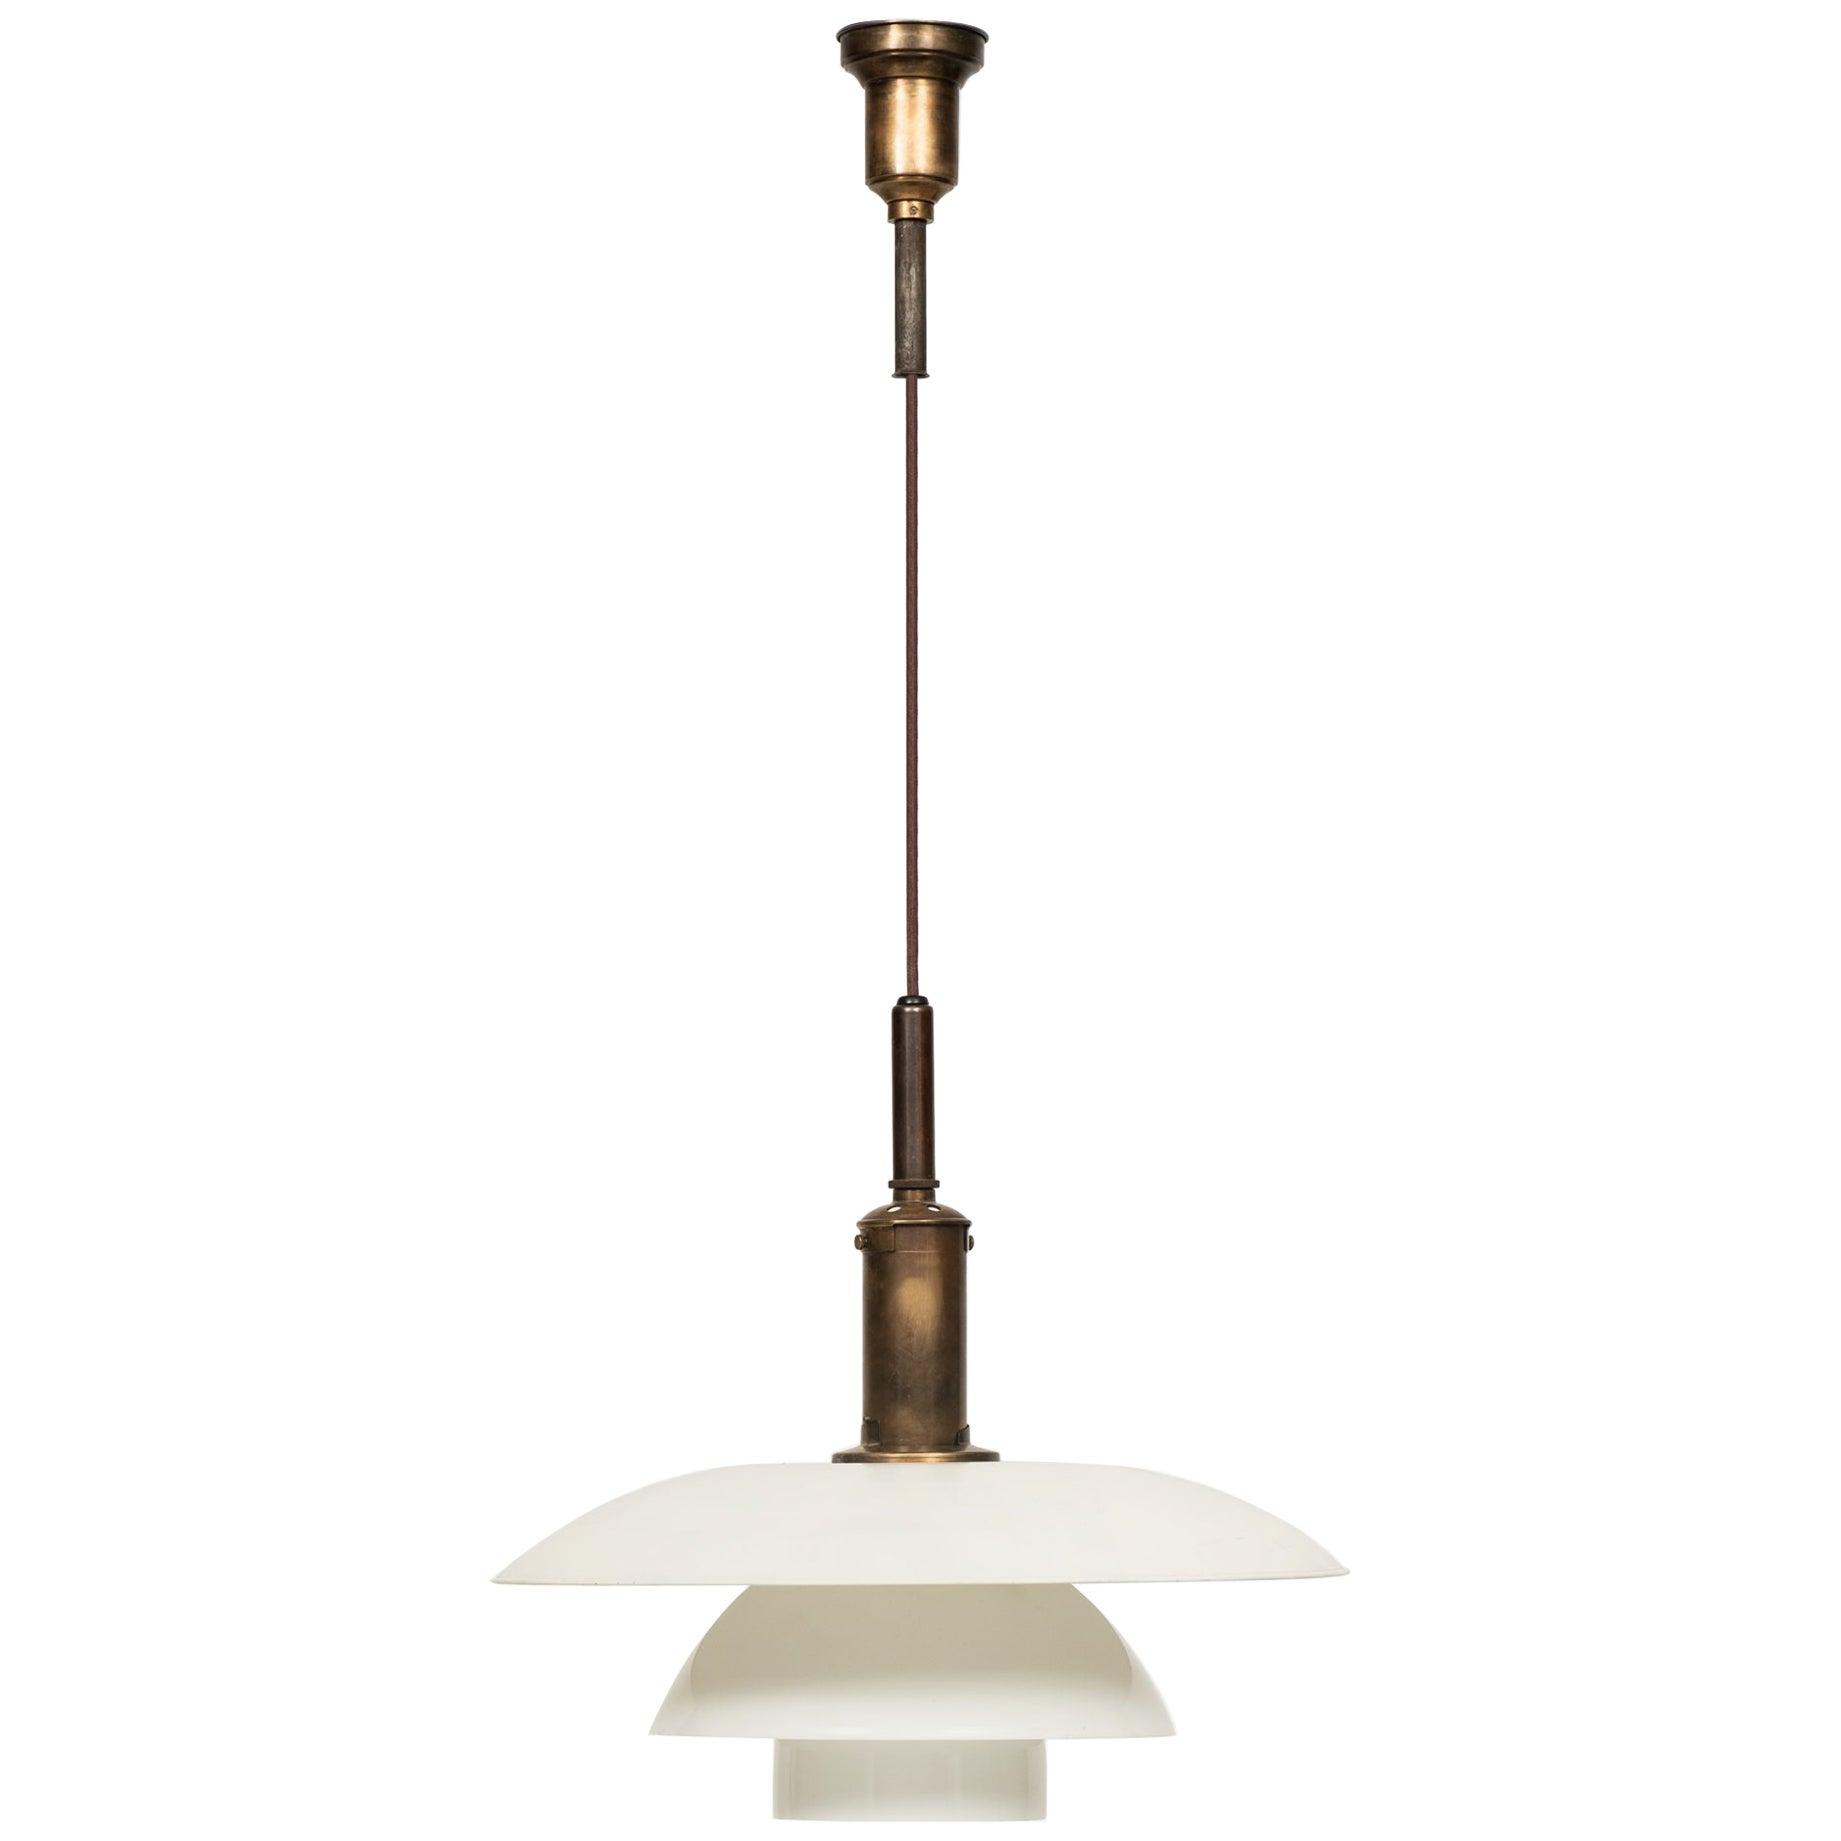 Poul Henningsen Ceiling Lamp Model PH-5/5 Produced by Louis Poulsen in Denmark